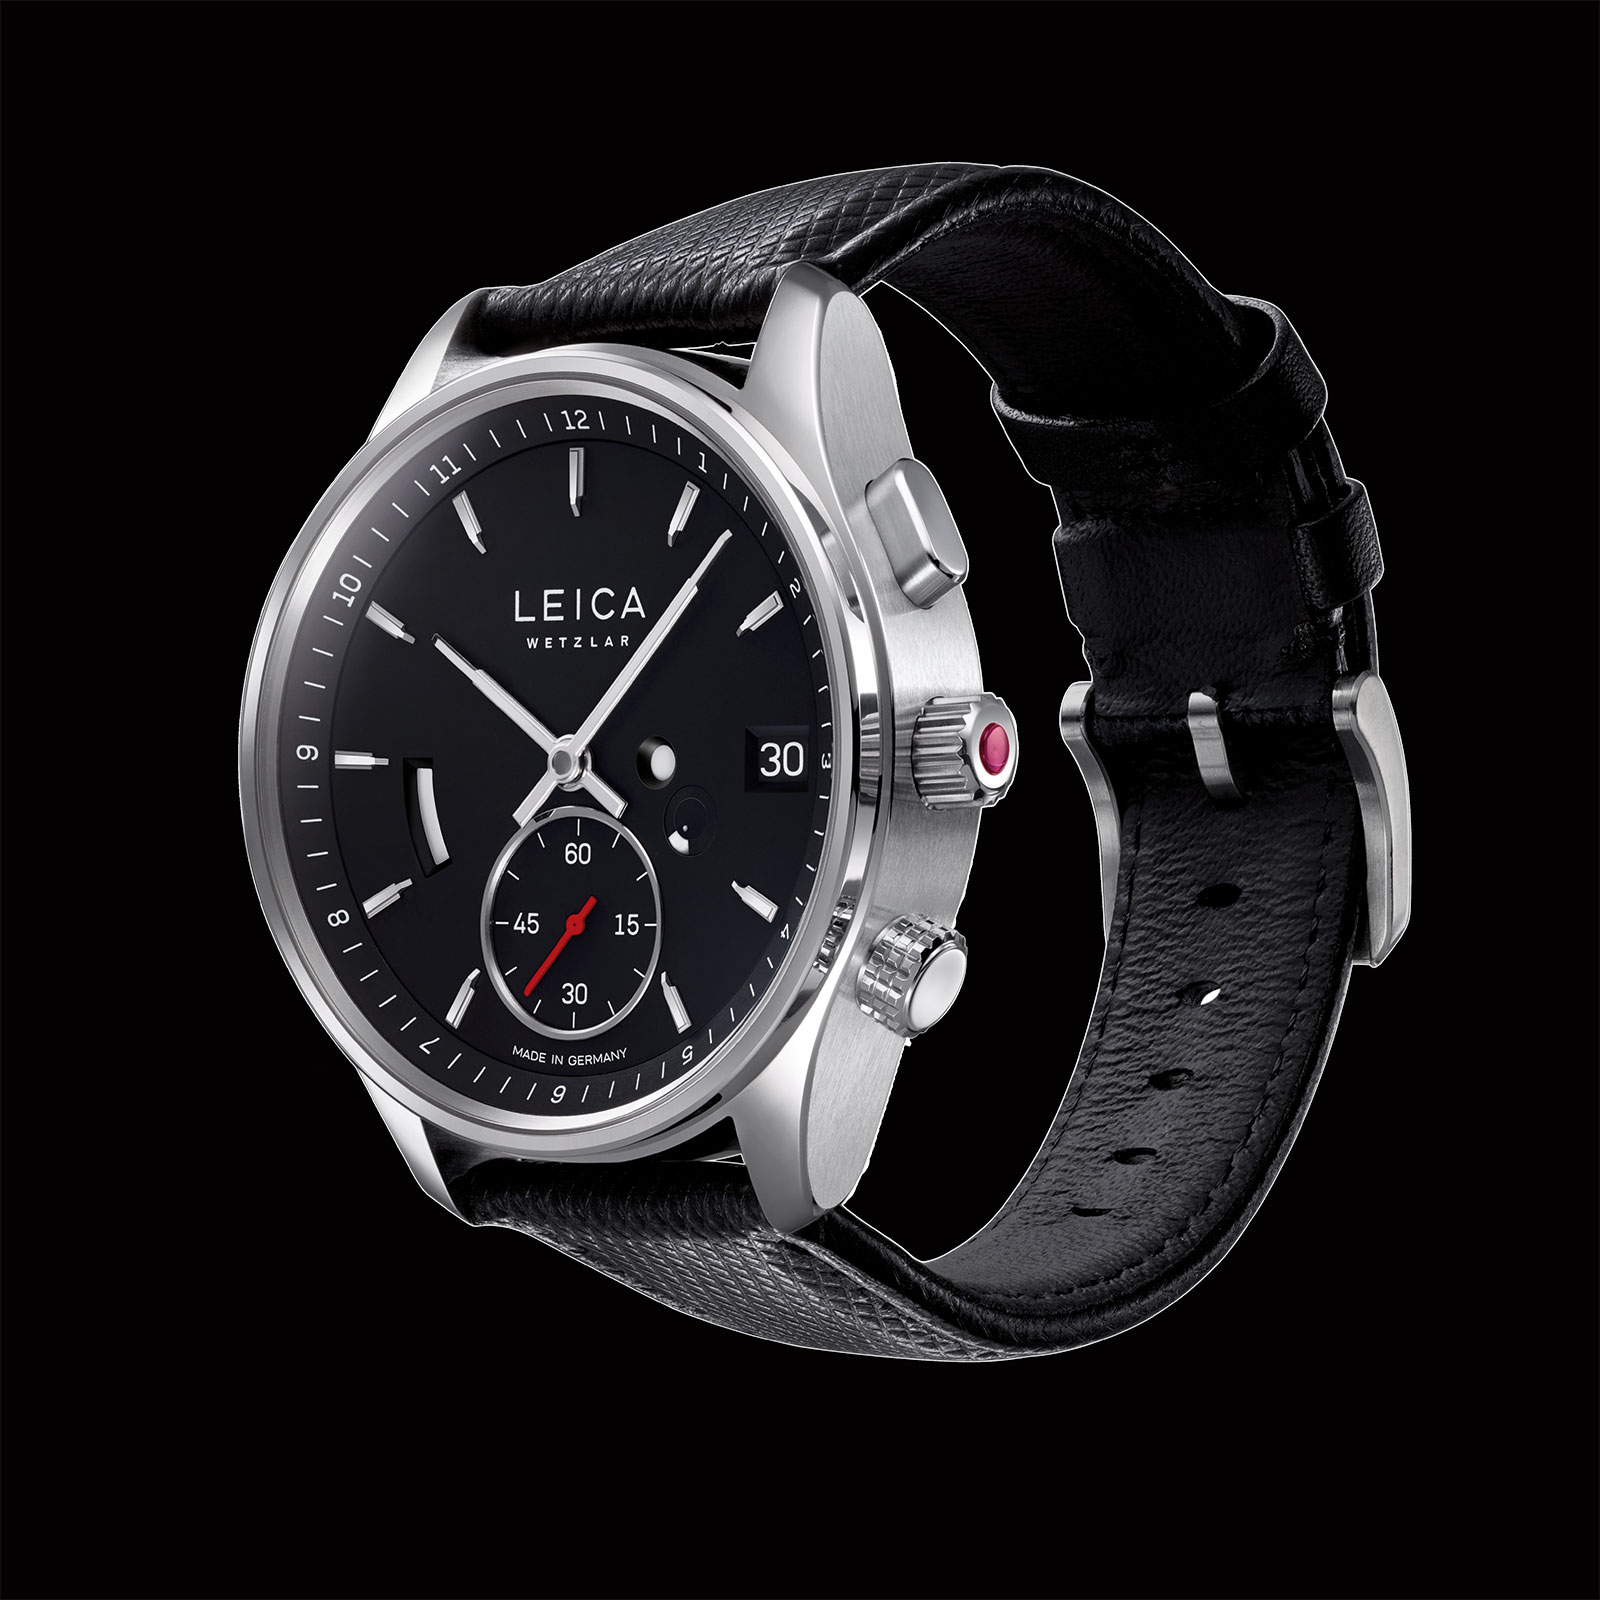 Leica L2 watch